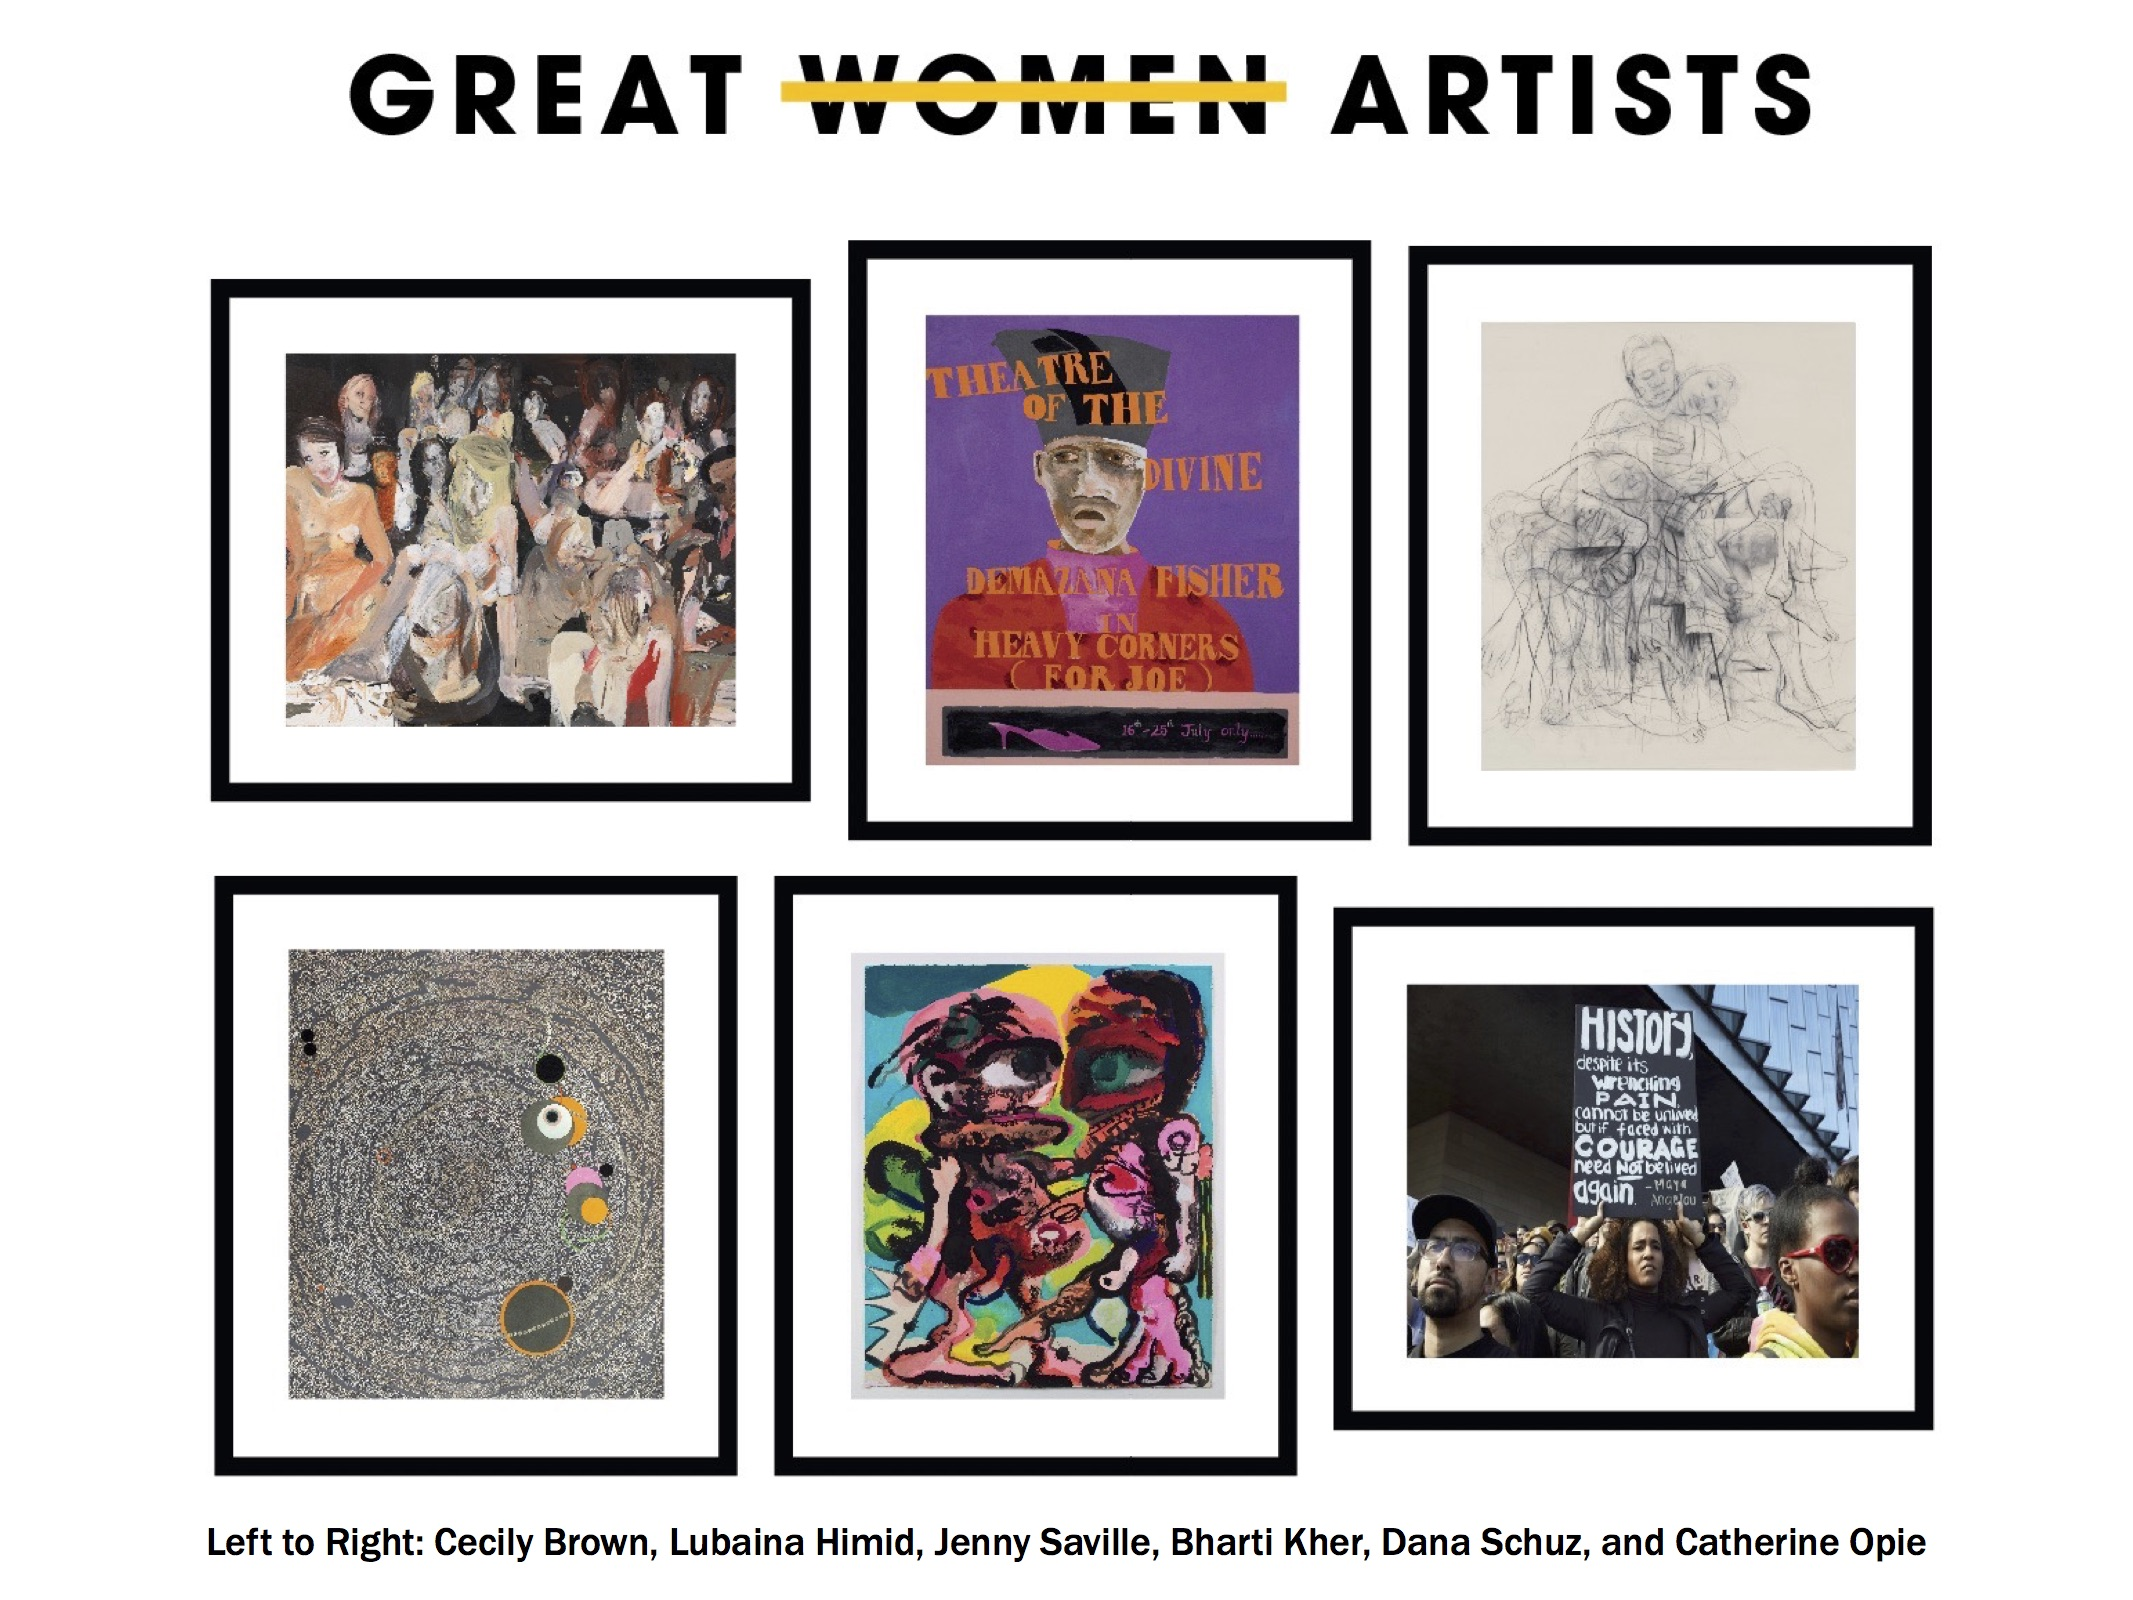 Great Women Artists Charitable Portfolio of Prints